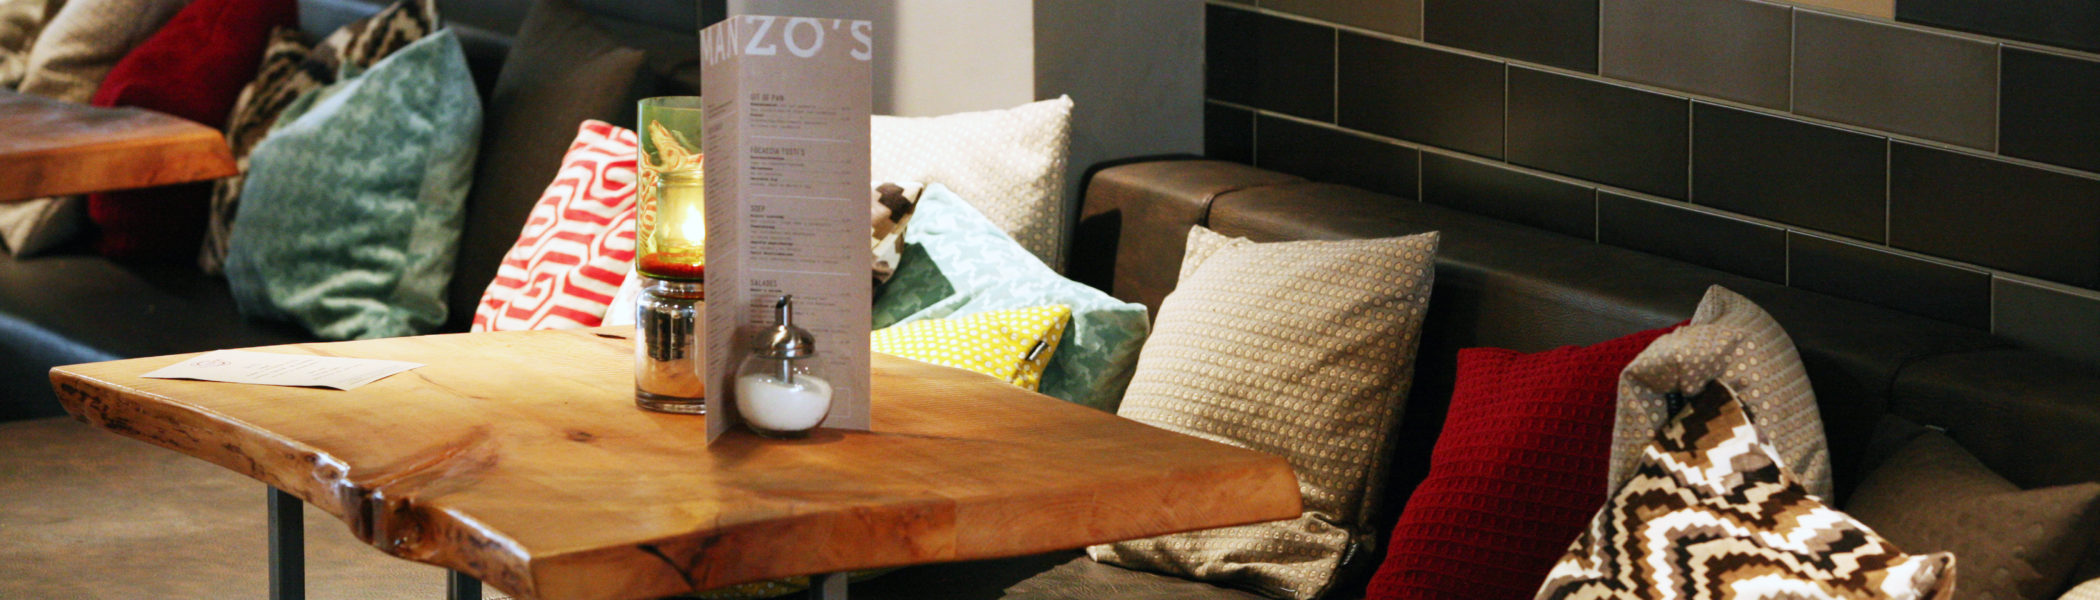 restaurant-zaandam-manzo-bar-bistro-lounge-loungebanken